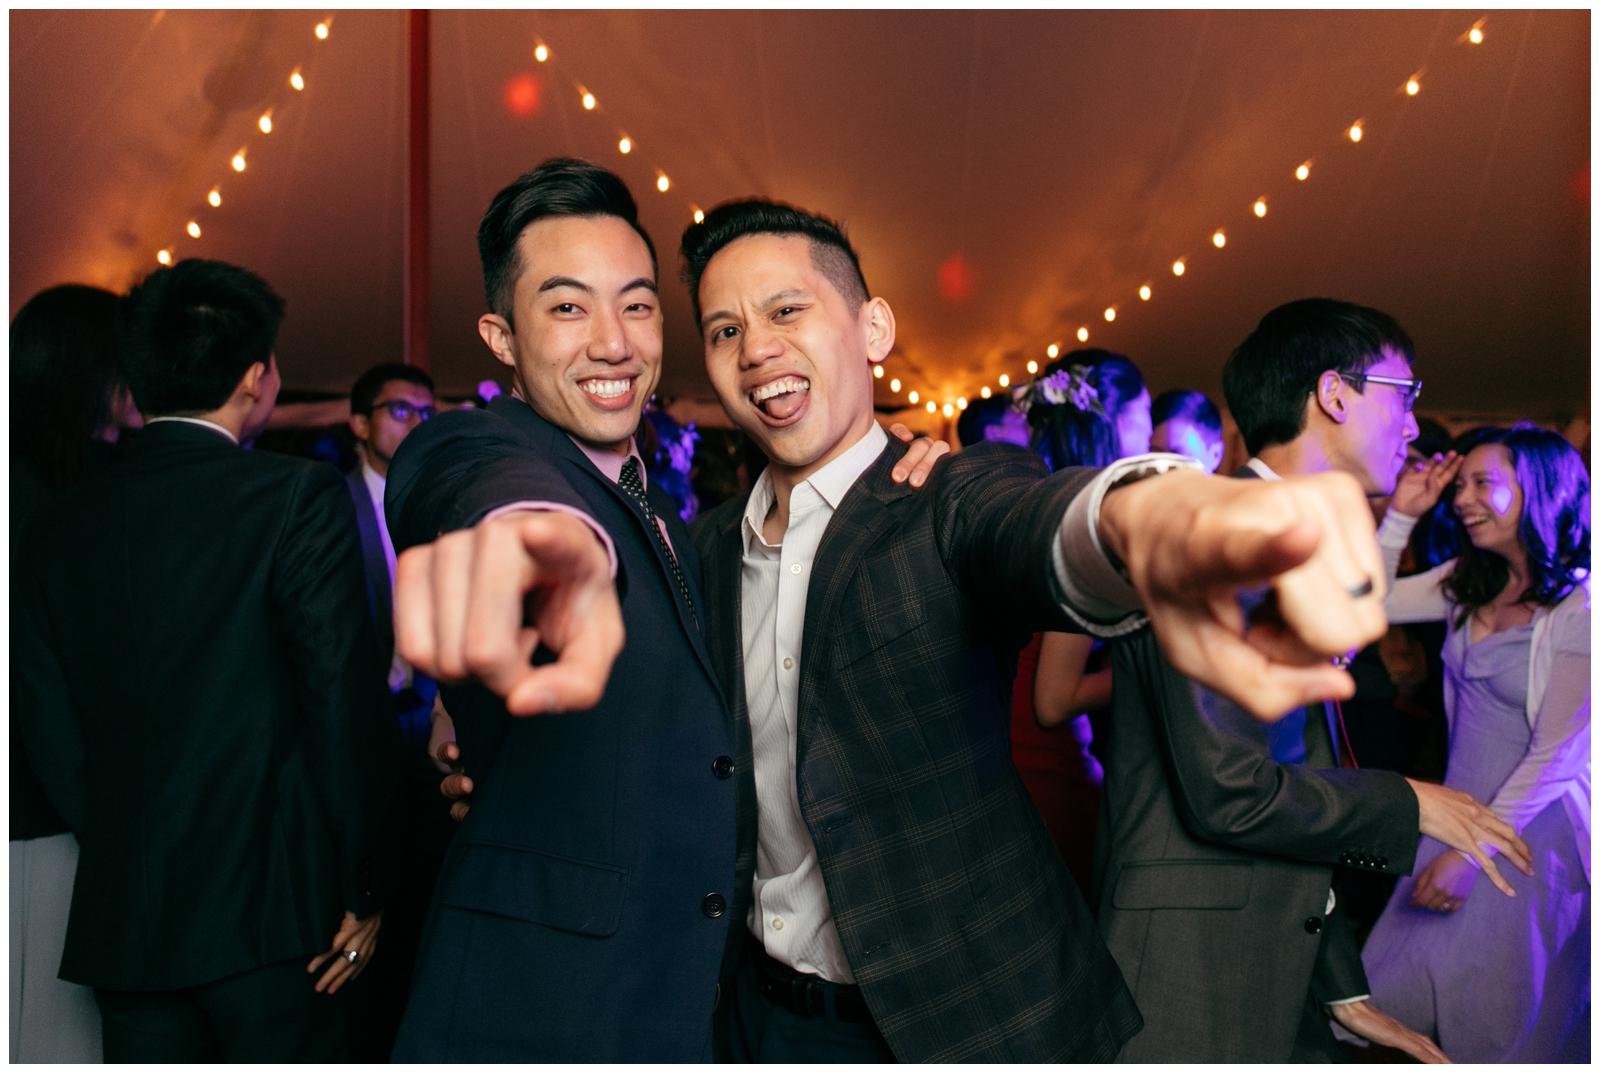 Boston wedding reception photos